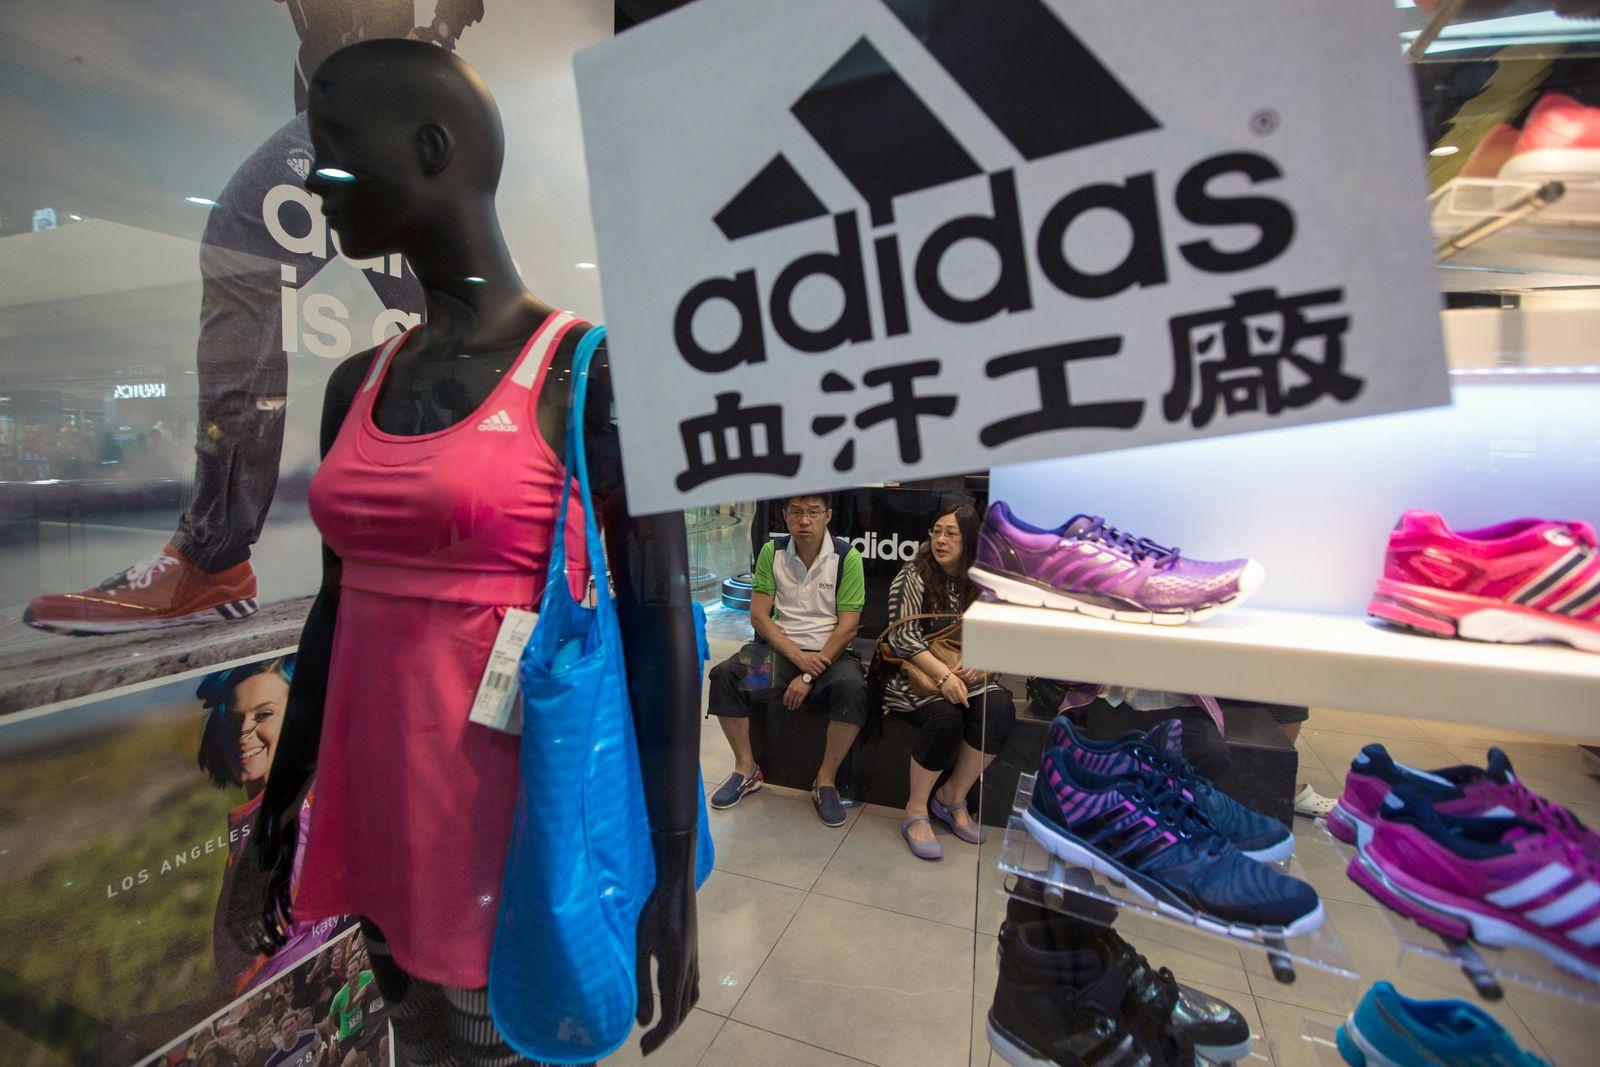 Adidas Store / China